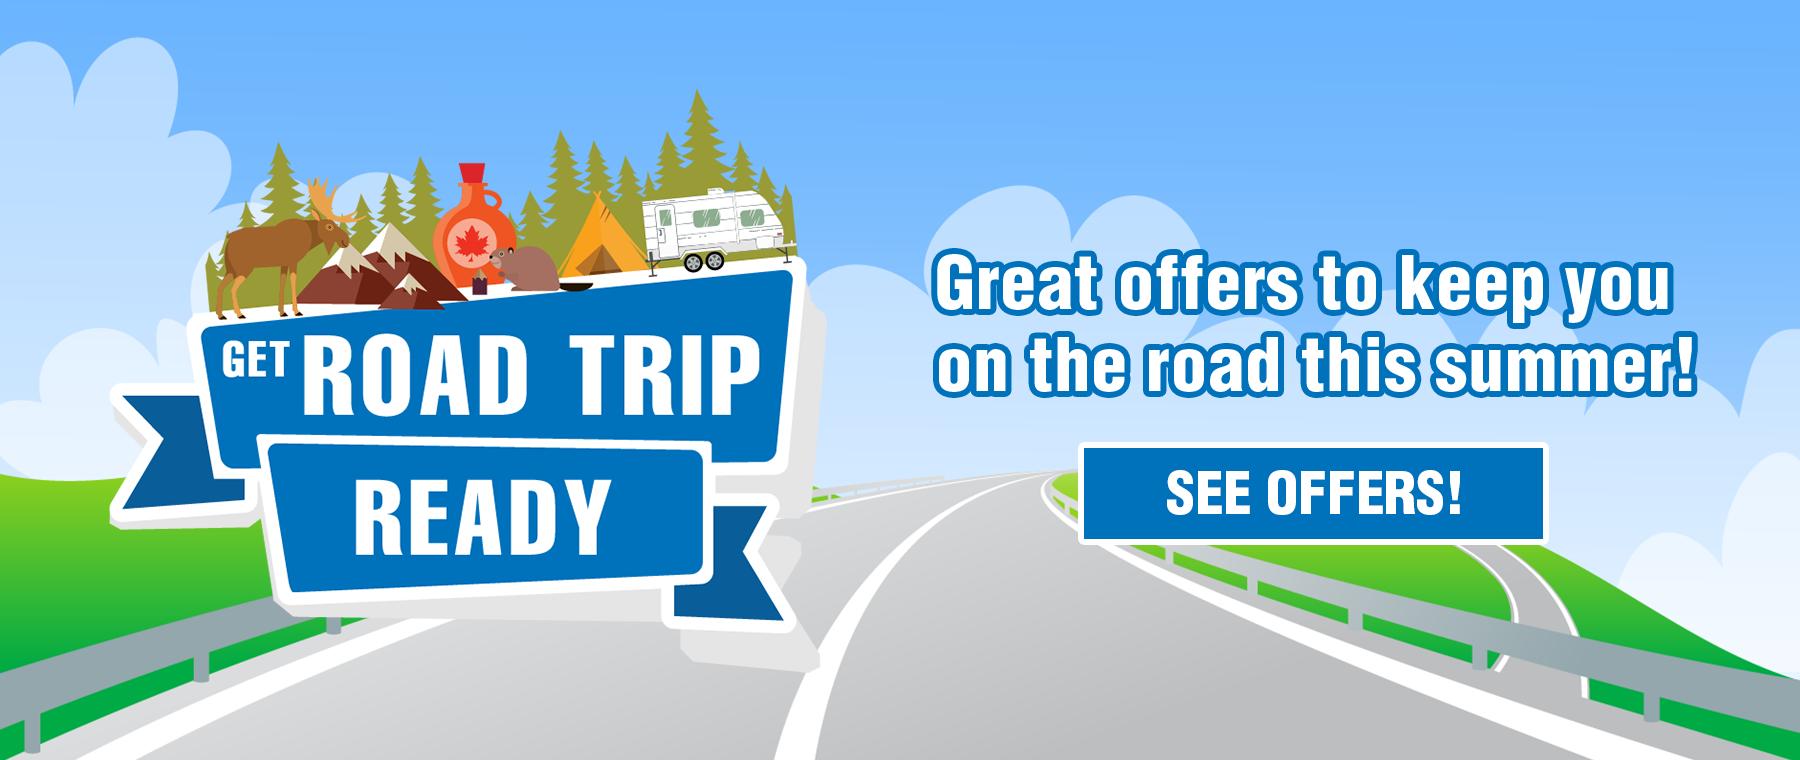 6294-GMES-Road Trip Ready-DESKTOP